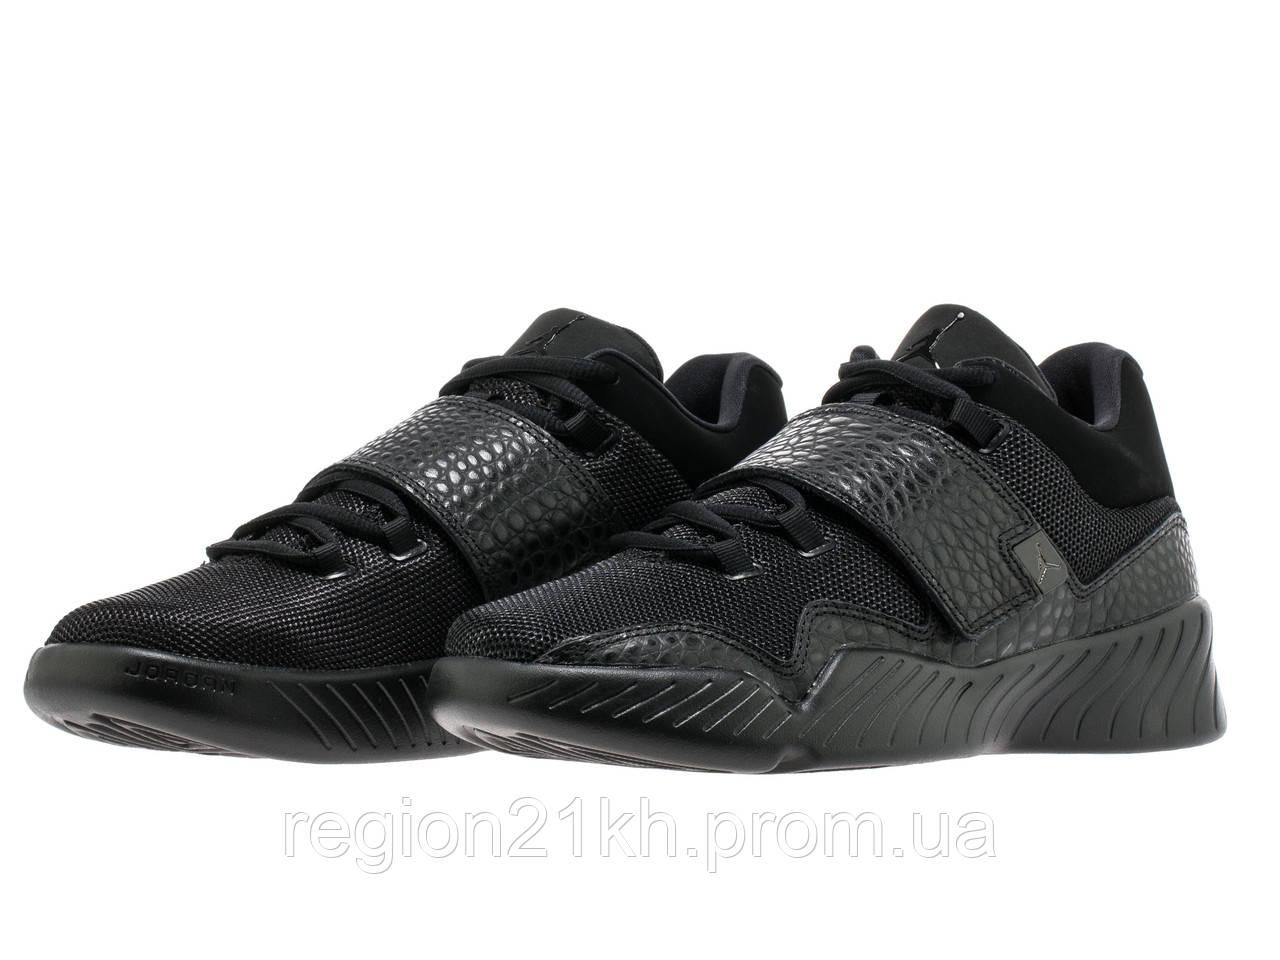 Тренинговые кроссовки Nike Air Jordan J23 Trainer Triple Black